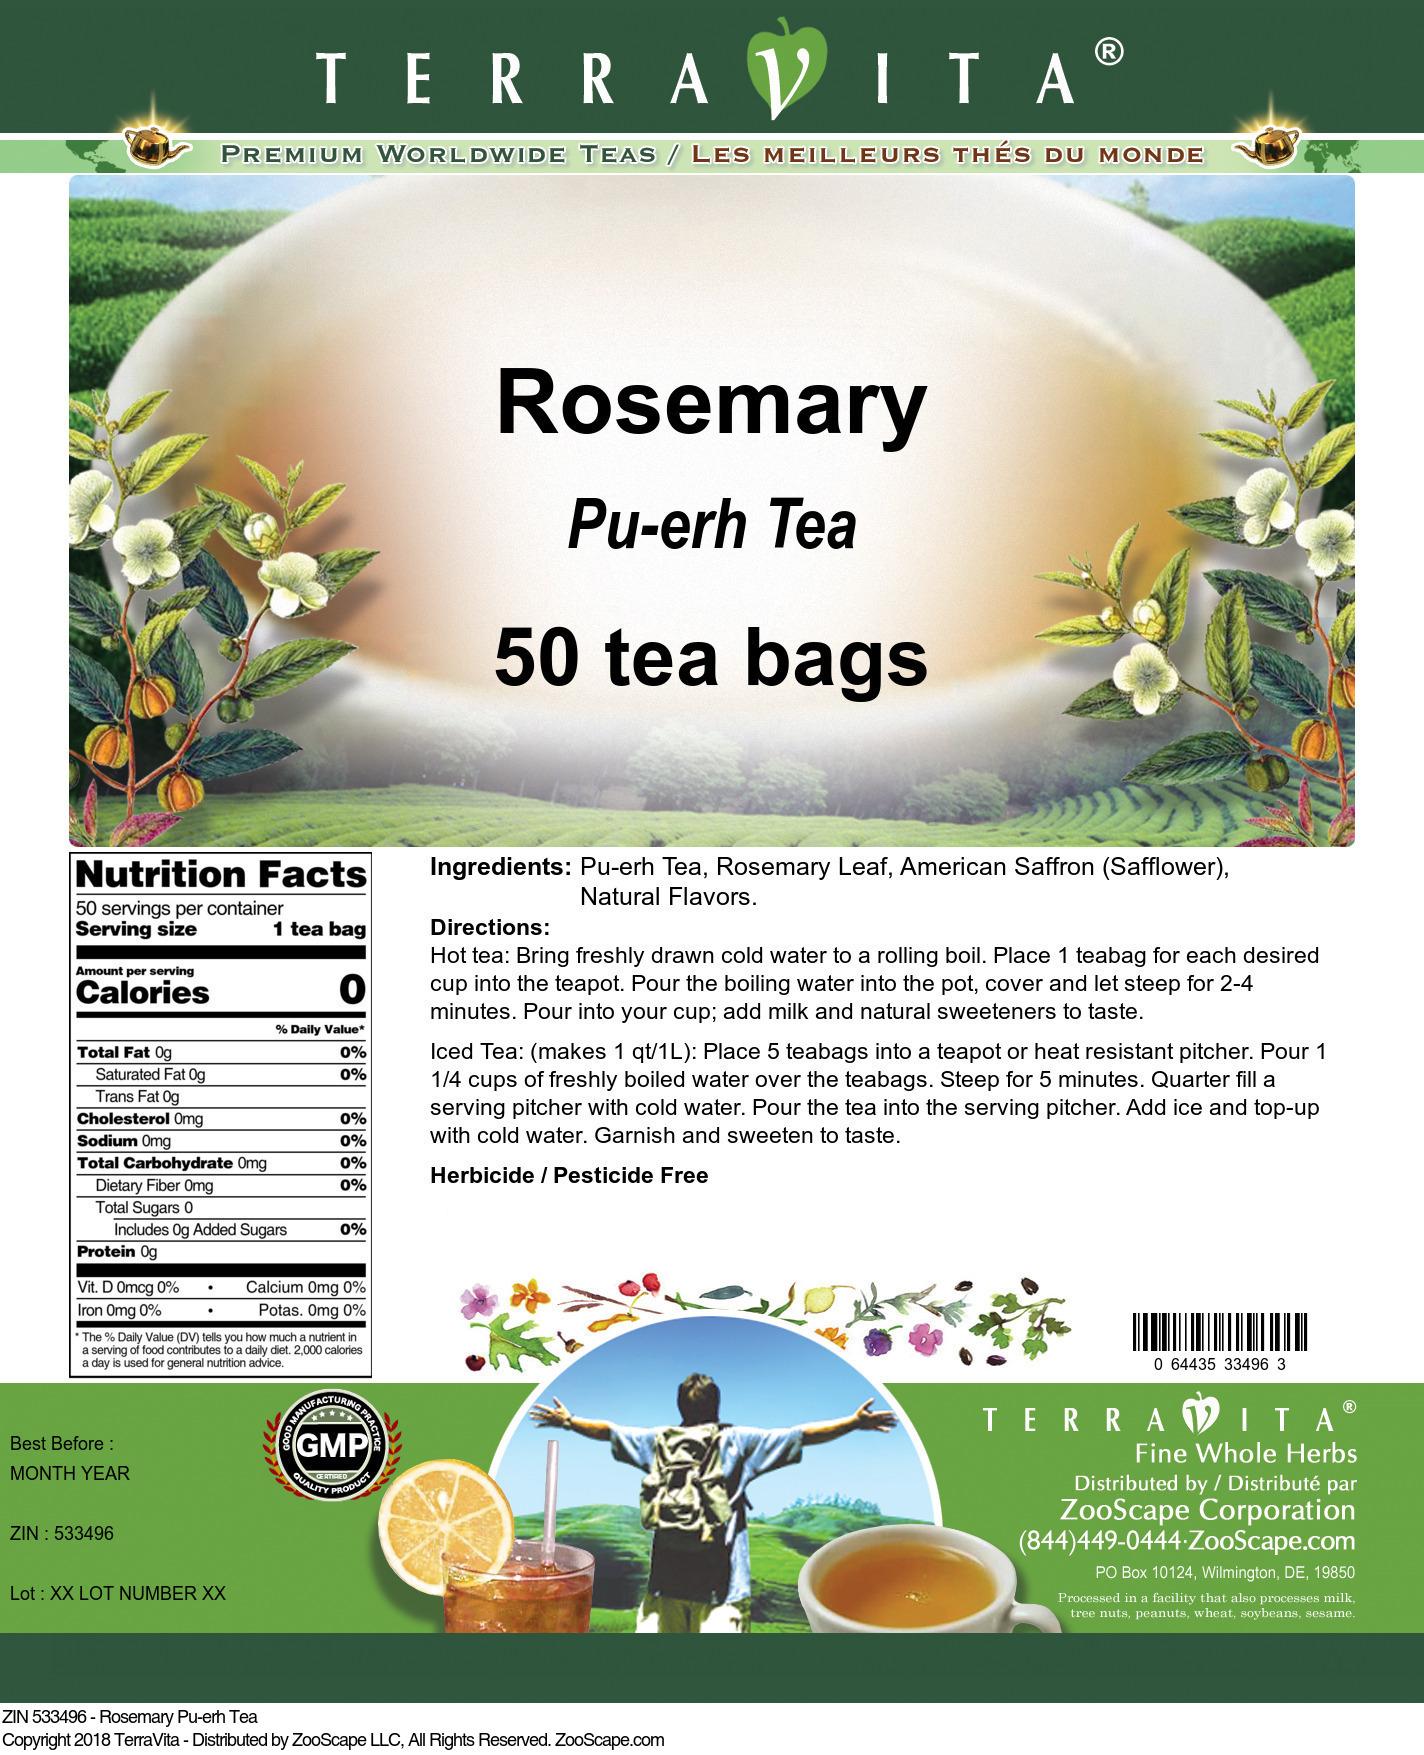 Rosemary Pu-erh Tea